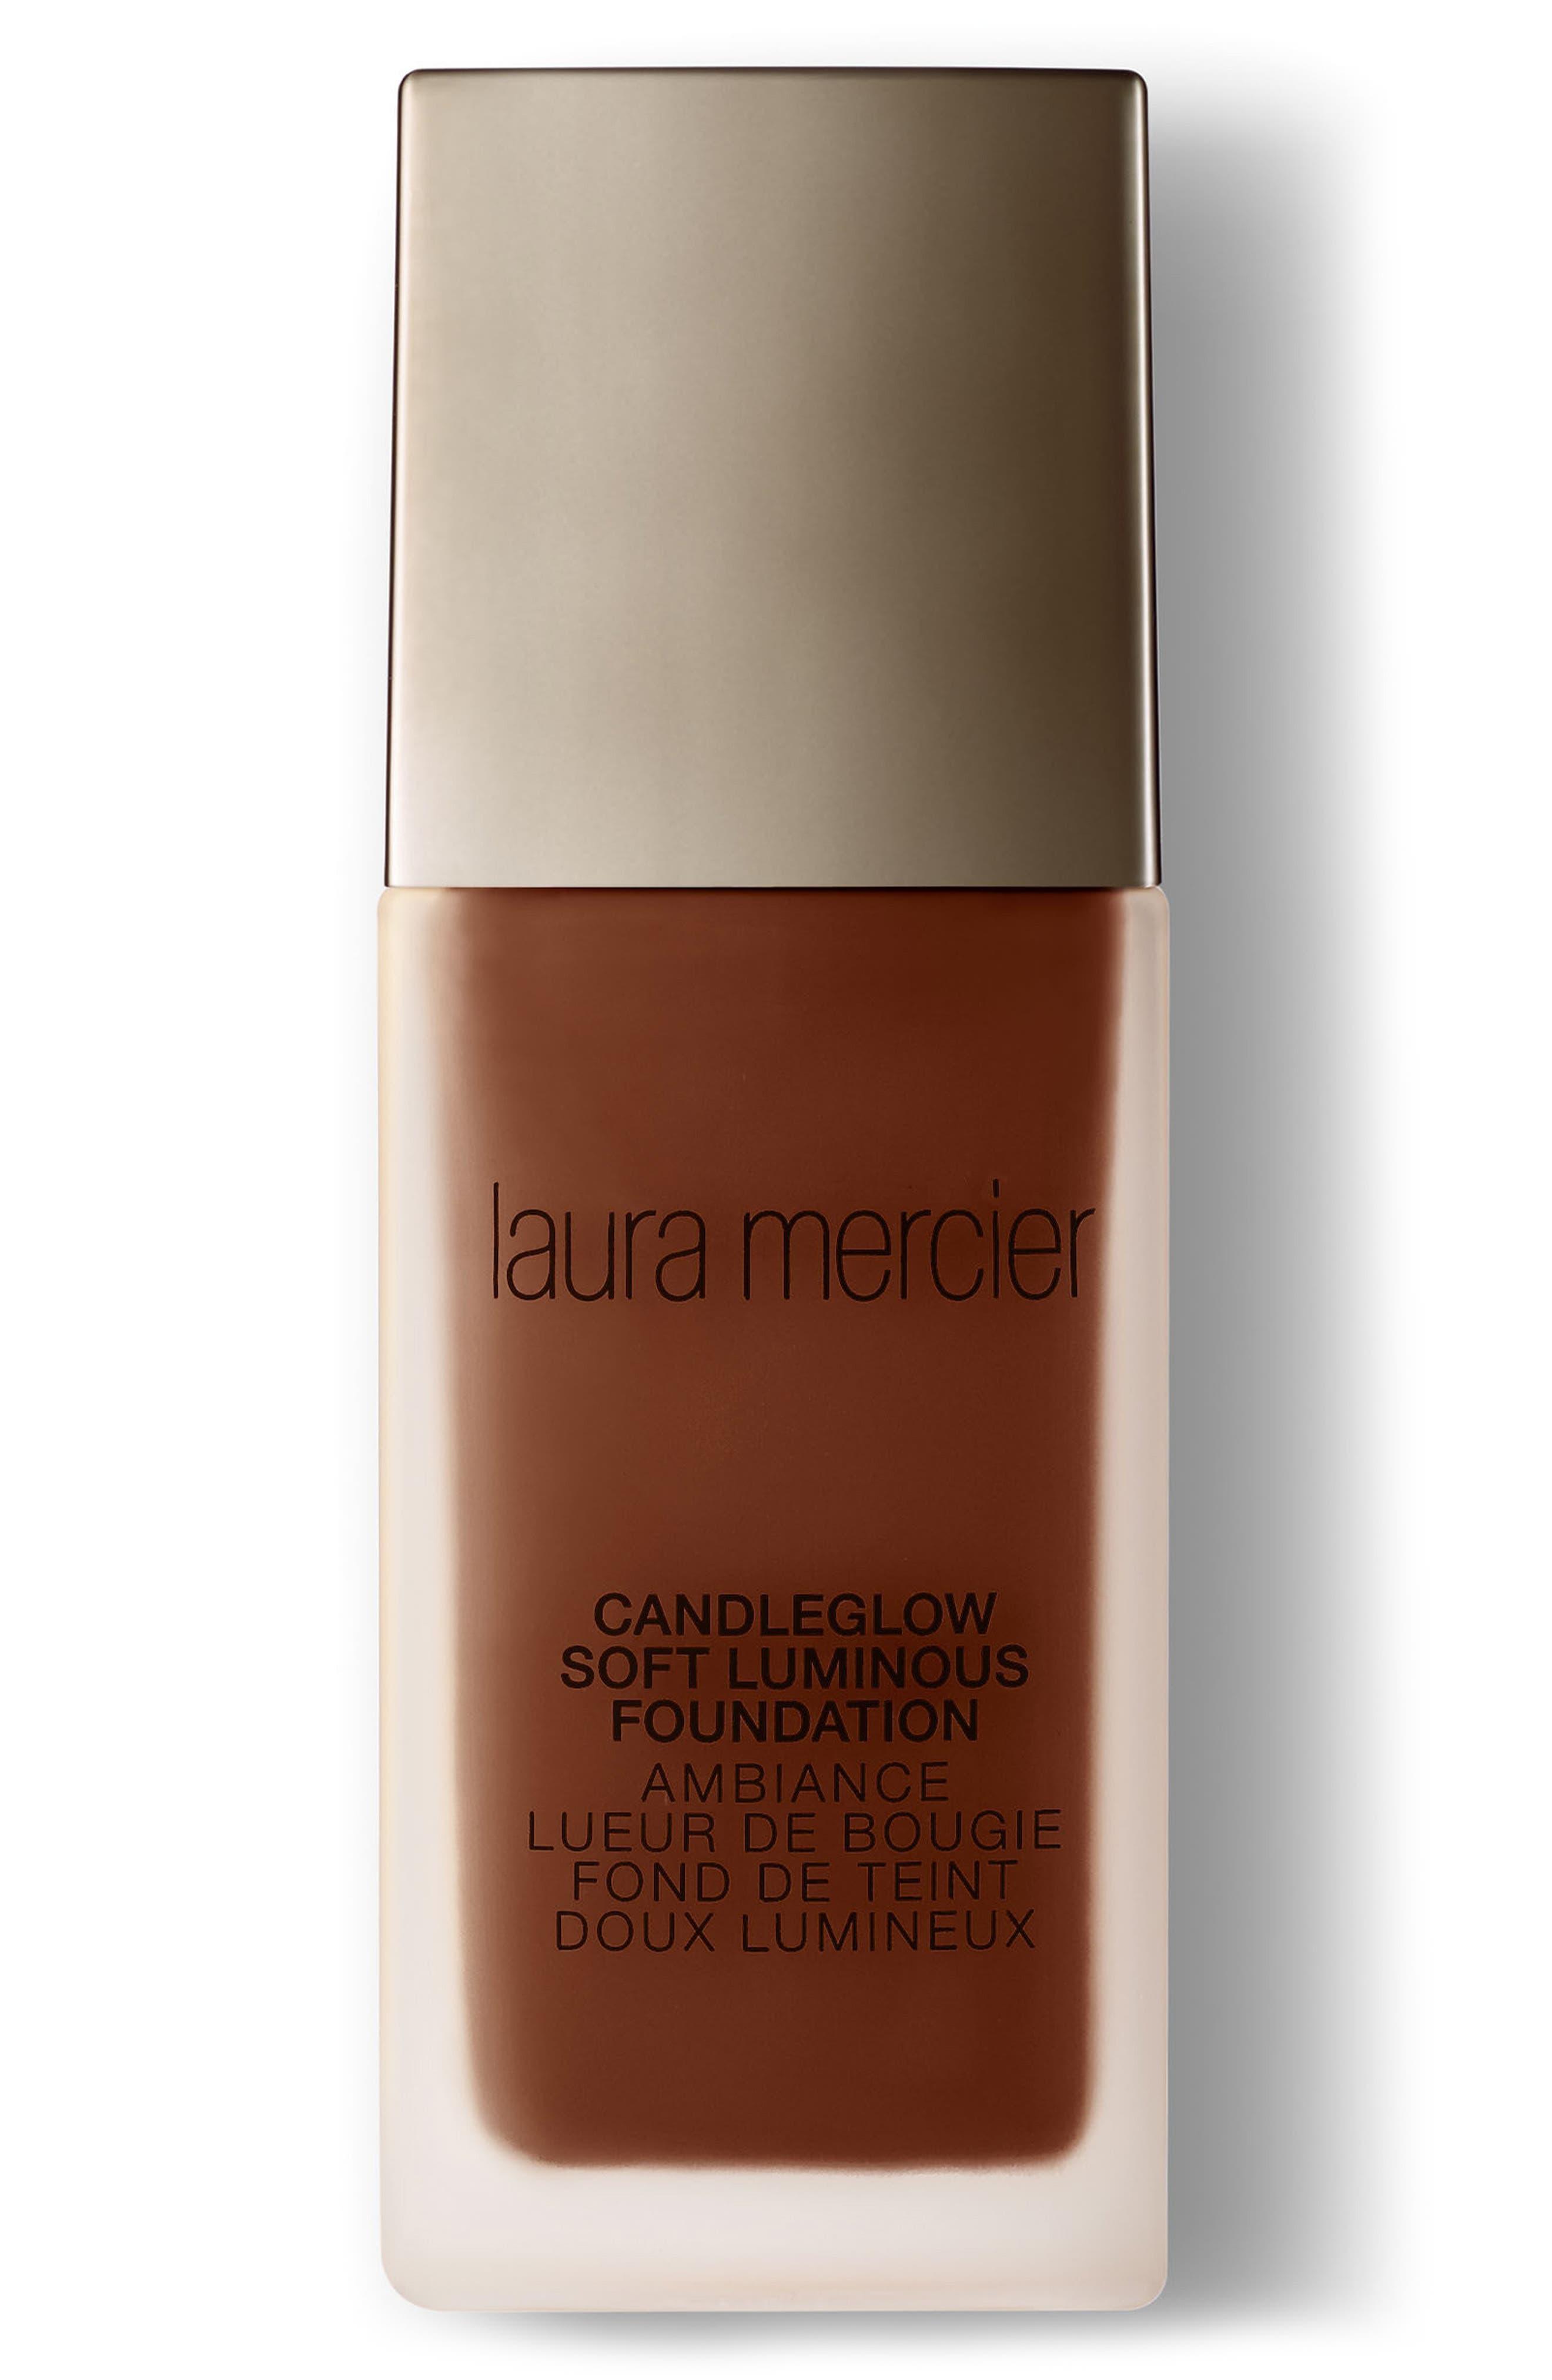 Candleglow Soft Luminous Foundation, Main, color, 200